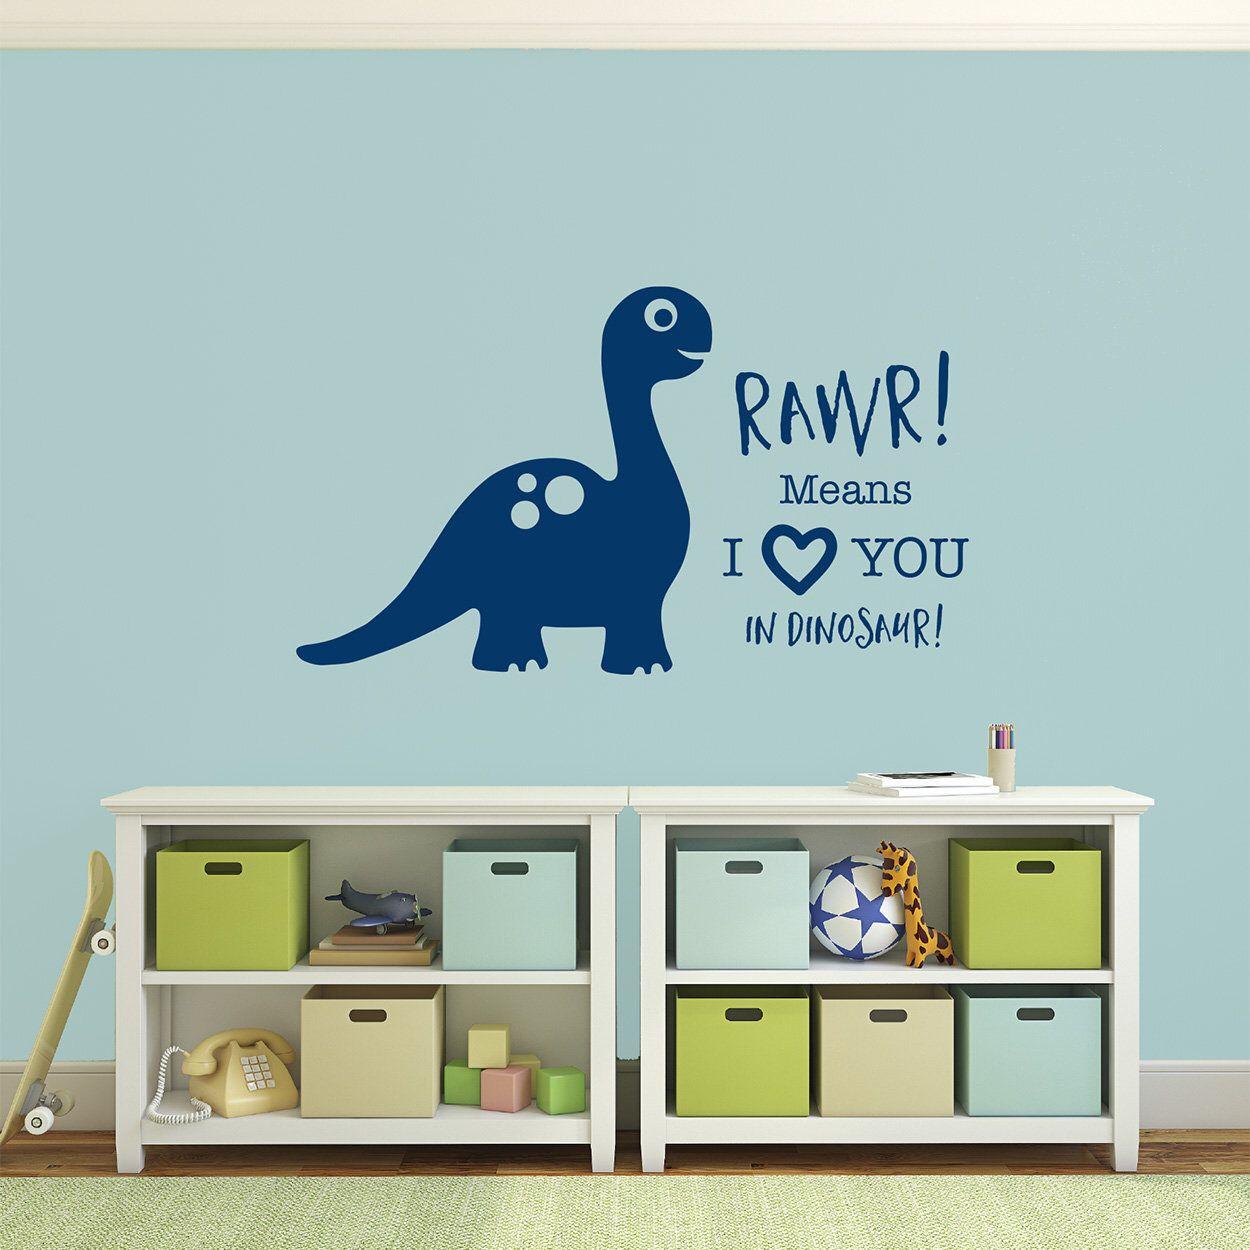 Dinosaur Rawr Means I Love You In Dinosaur Wall Sticker